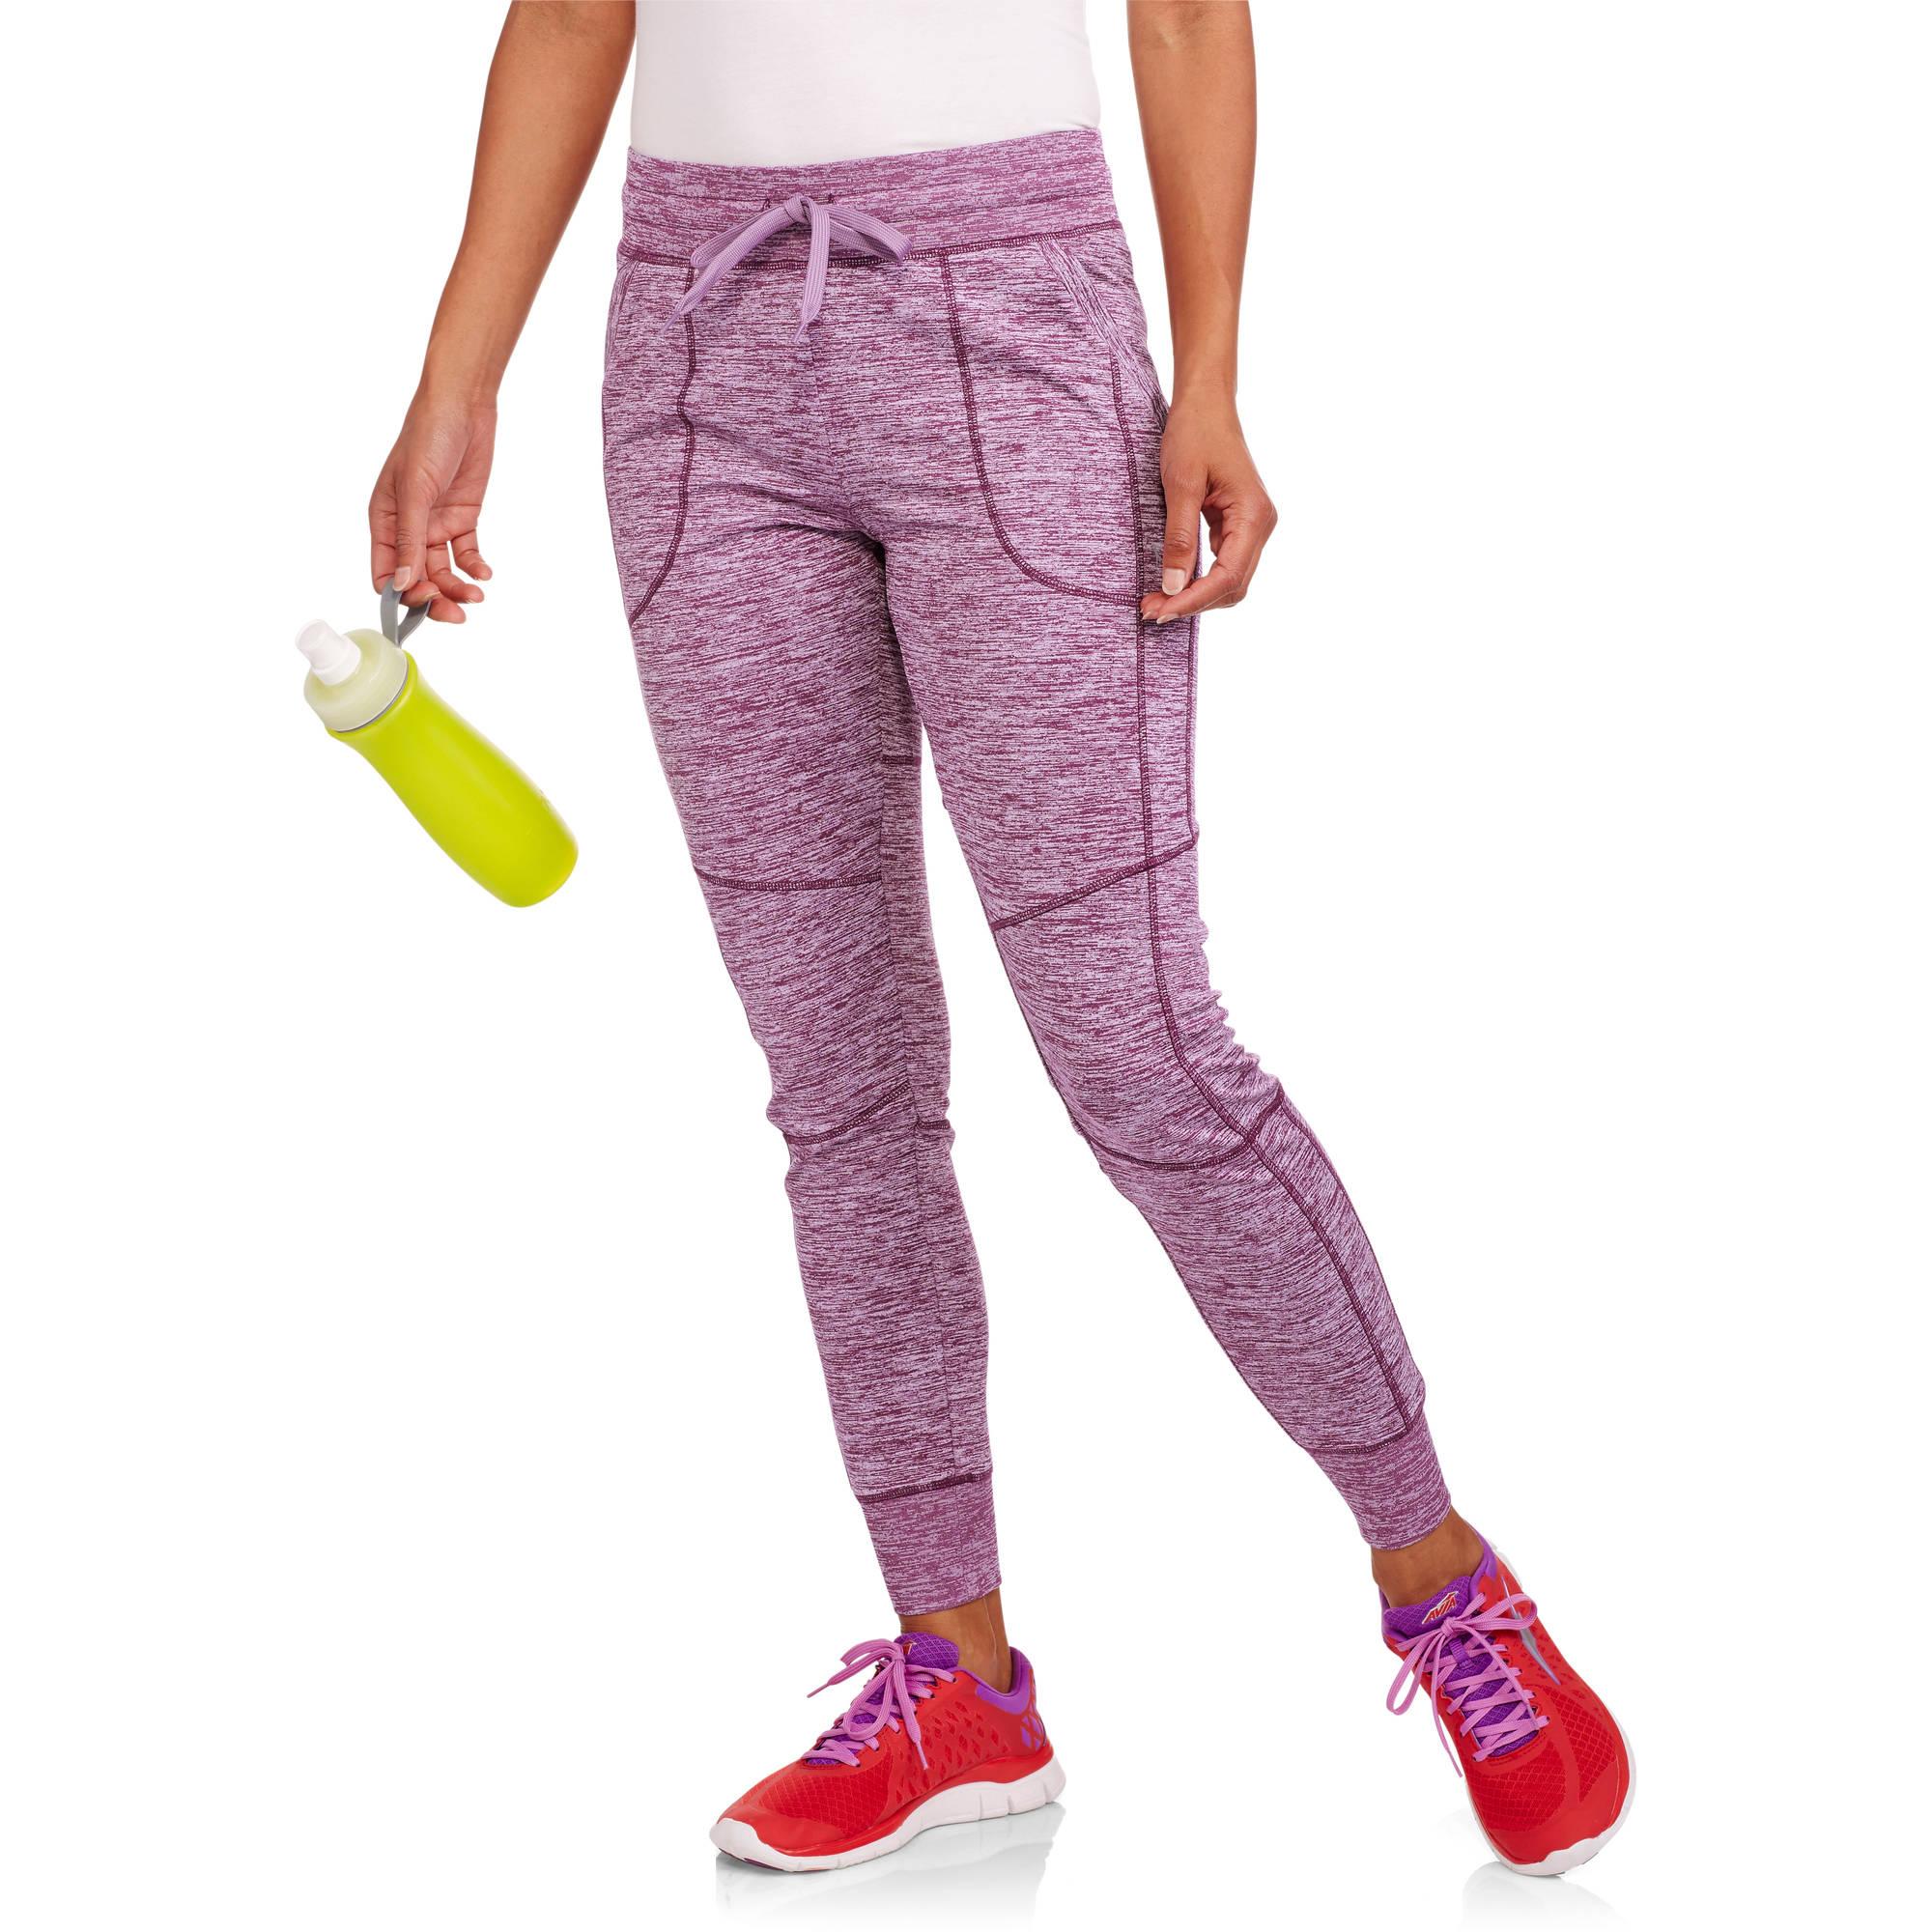 Danskin Now Women's Tech Fleece Jogger with Front Pockets